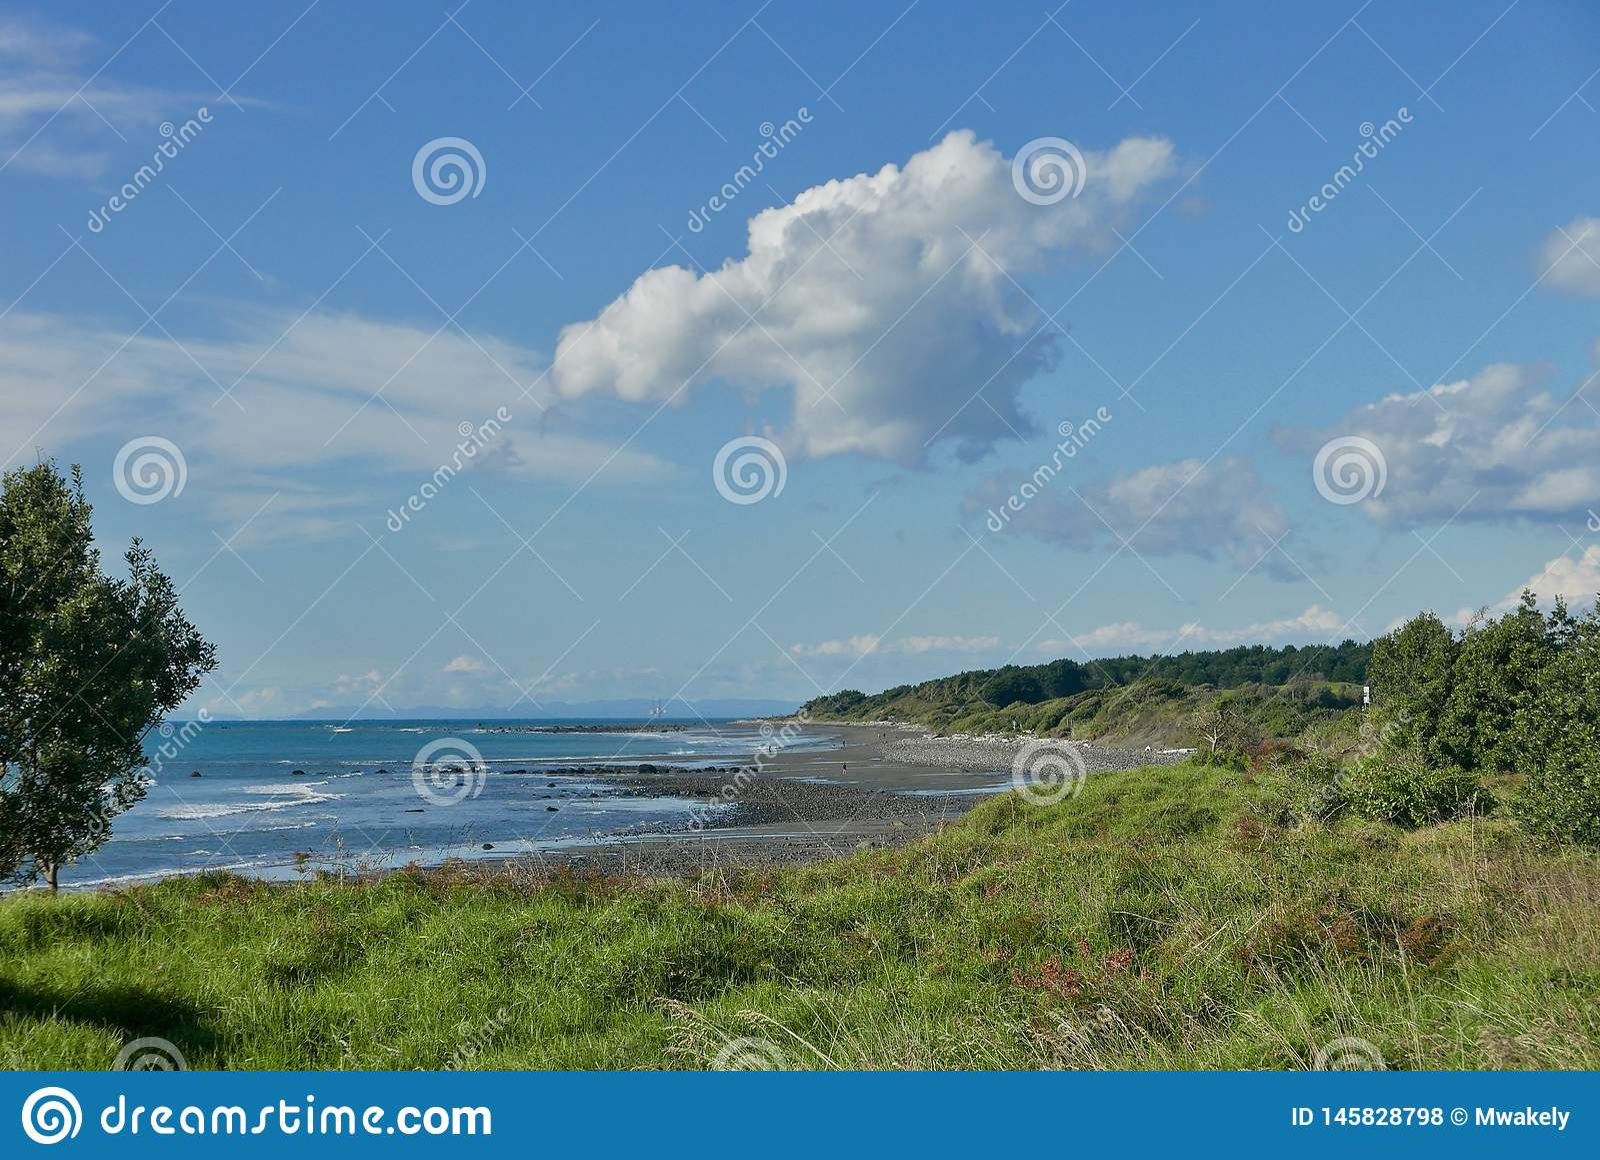 Beach view at Waiwhakaiho